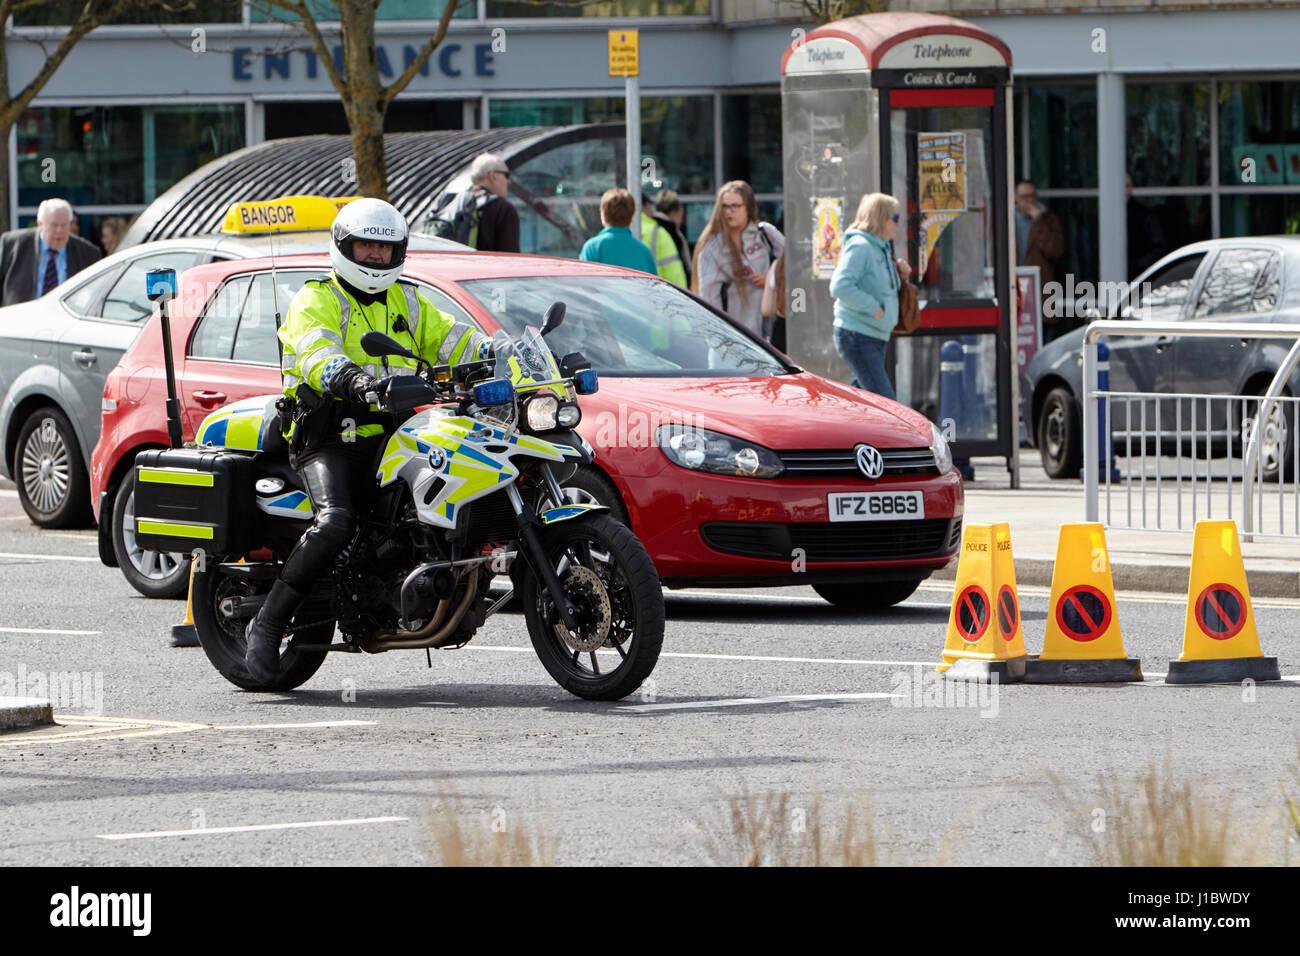 psni police officer traffic police on bmw motorbike northern ireland - Stock Image